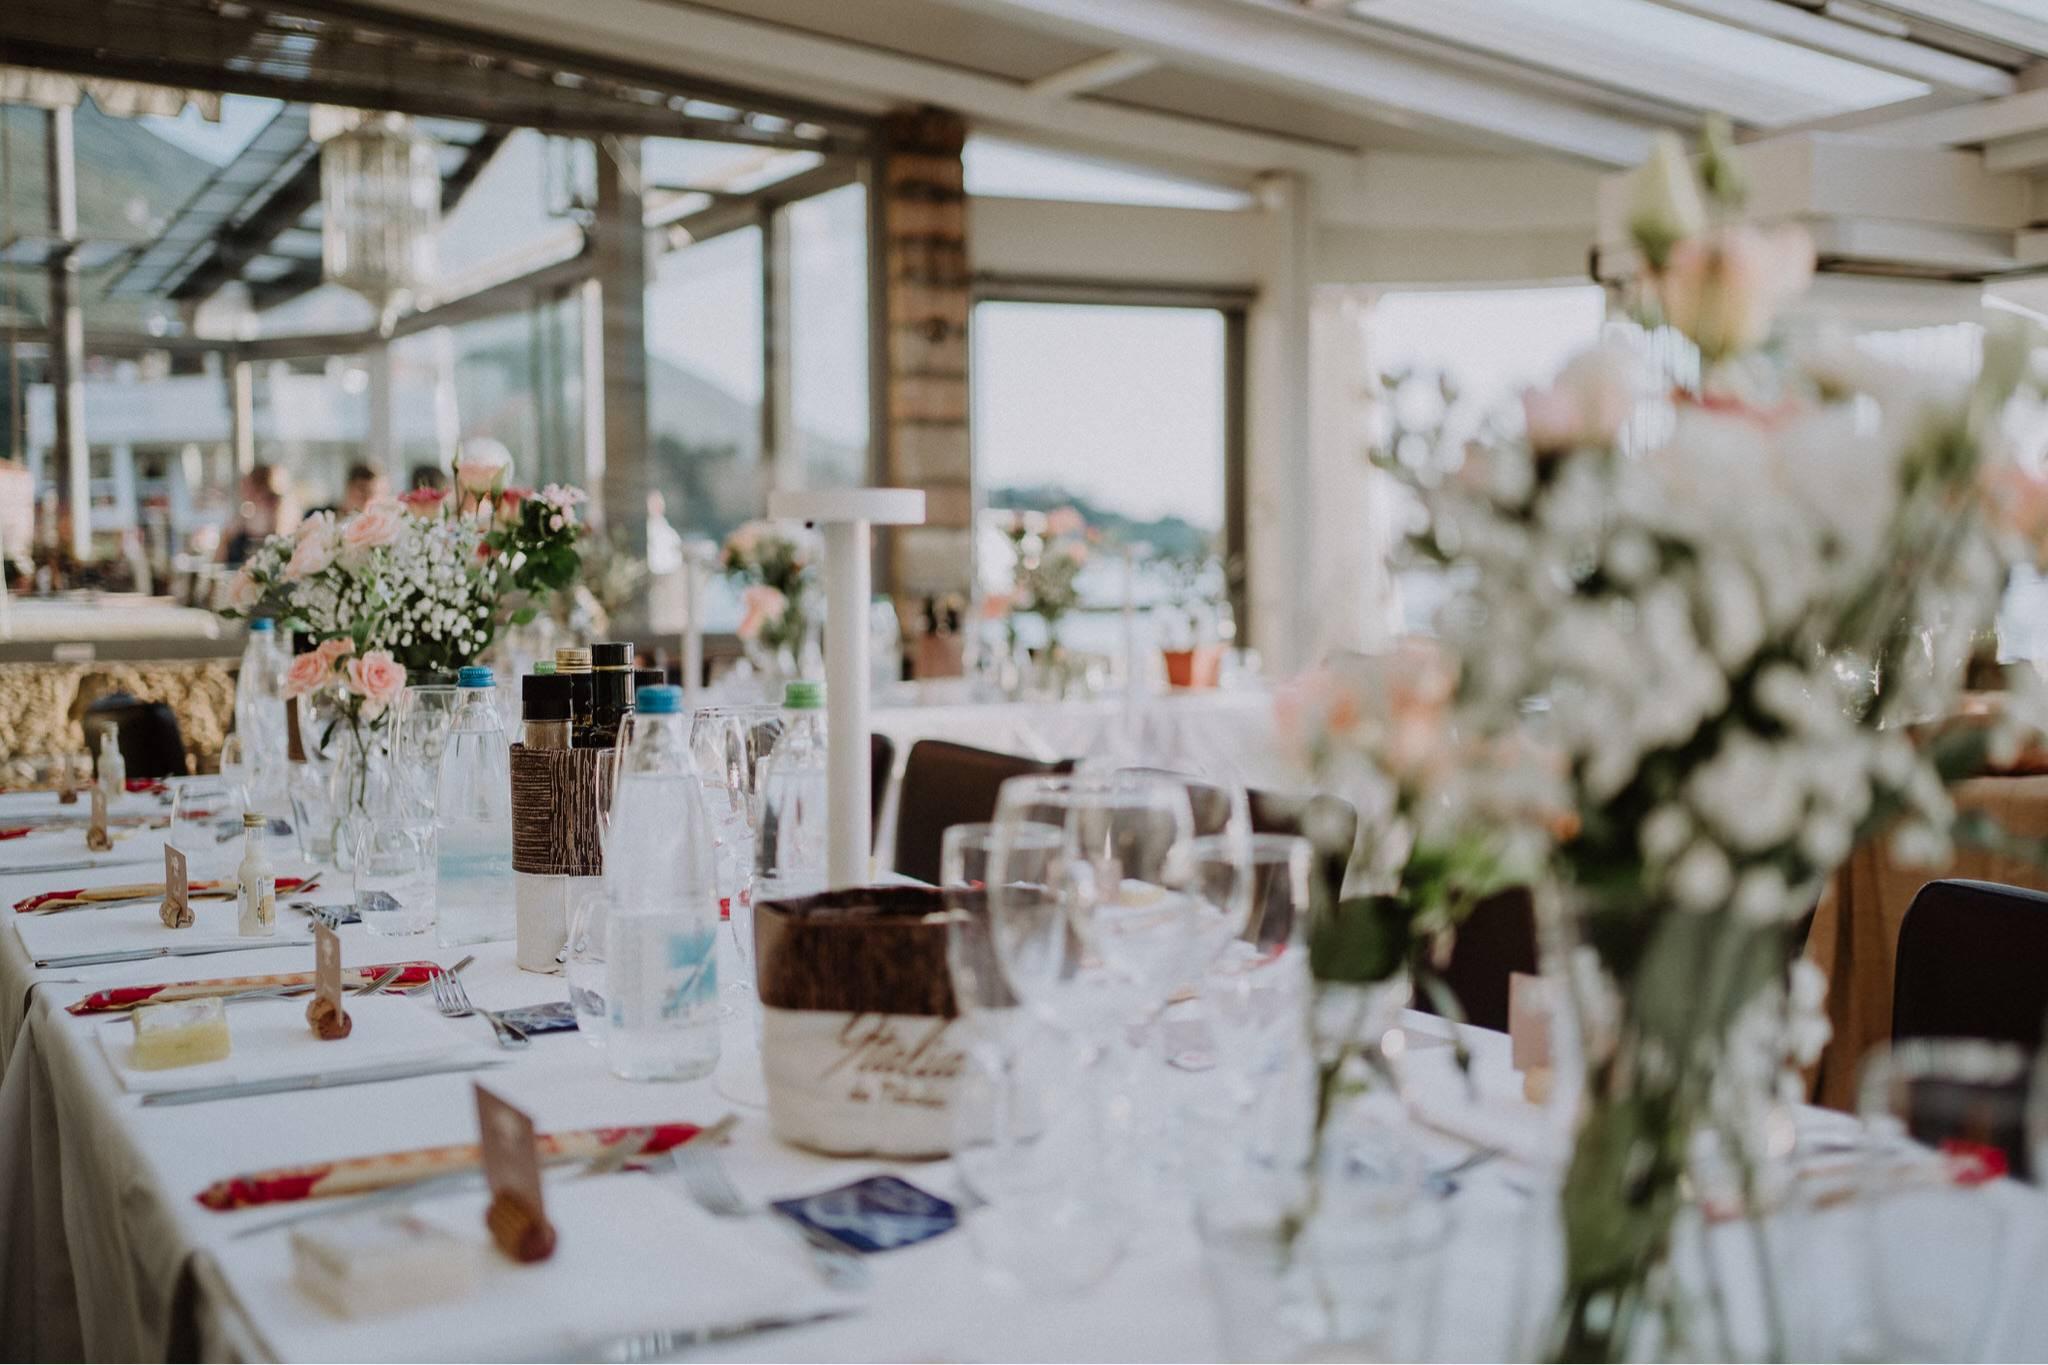 59 la 04 abend 1009 weddinphotographer Hochzeitsfotograf newzealand hamilton Weddingphotography Stuttgart